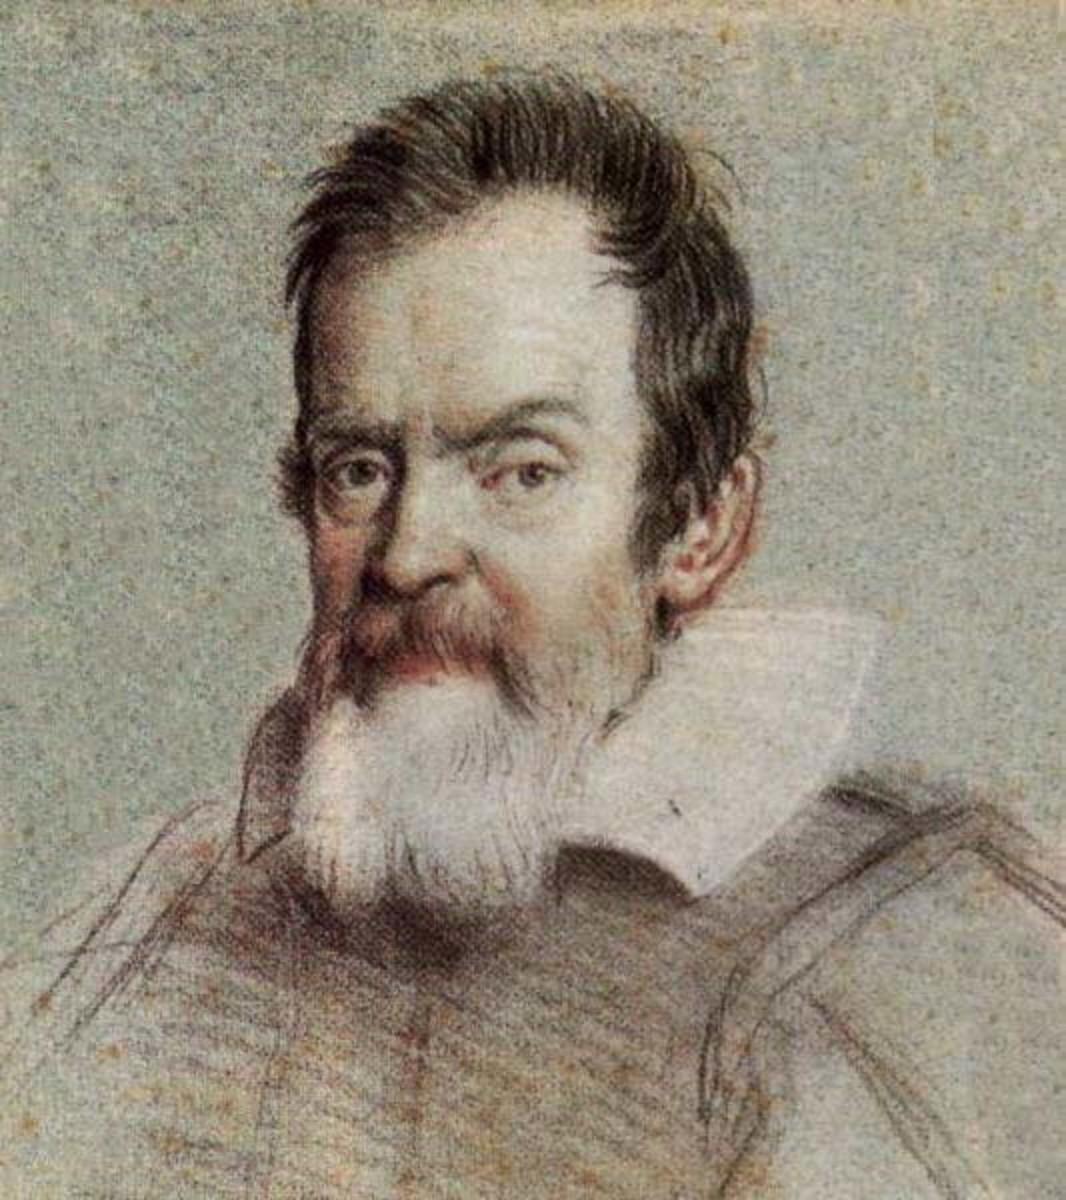 Galileo Galilei. Portrait by Ottavio Leoni (1578-1630).